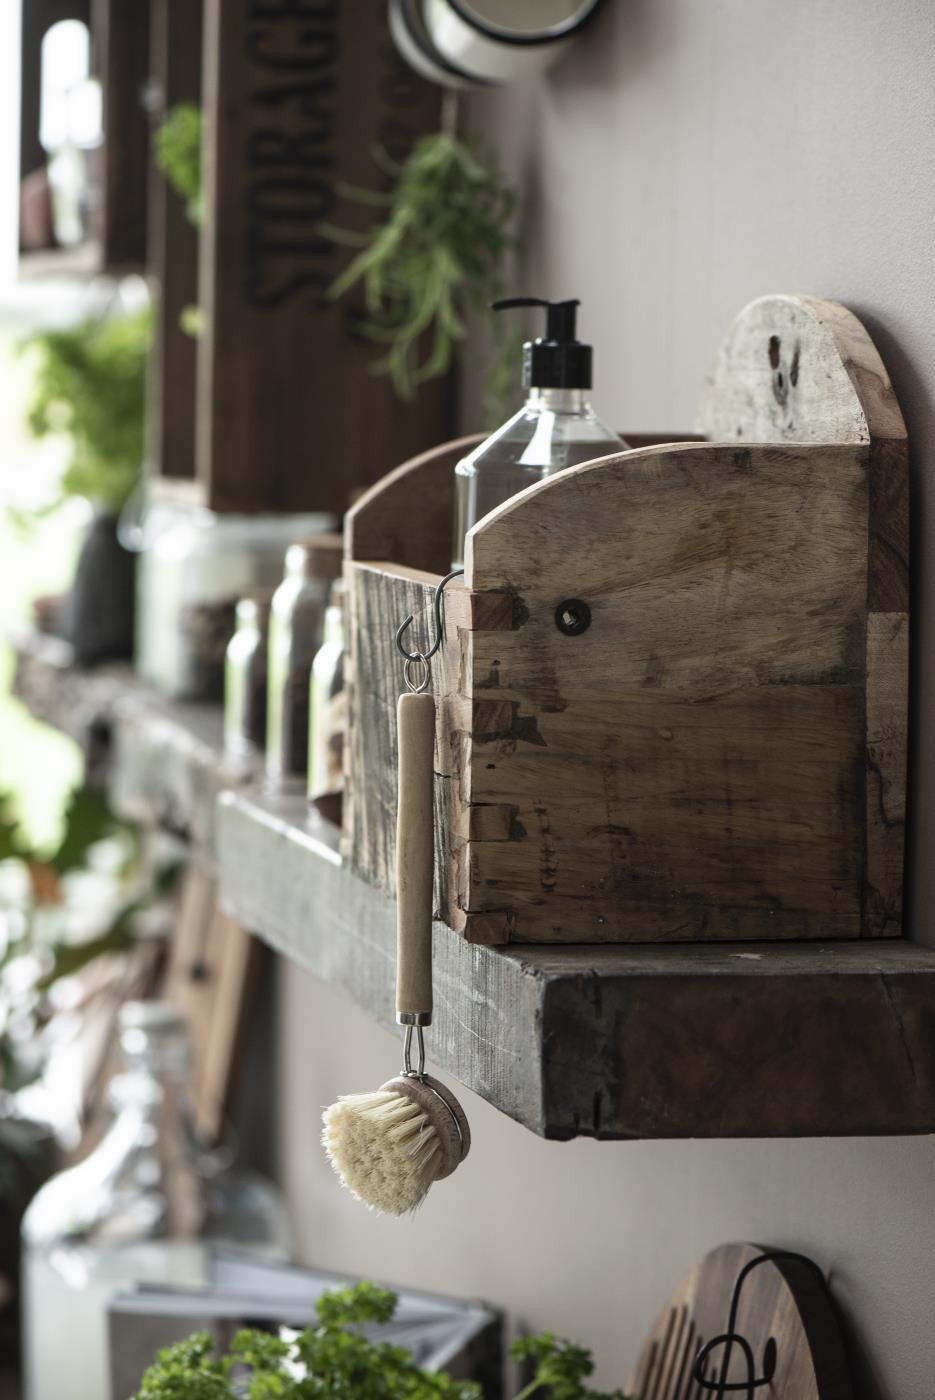 Spülbürste aus Holz mit Naturborsten